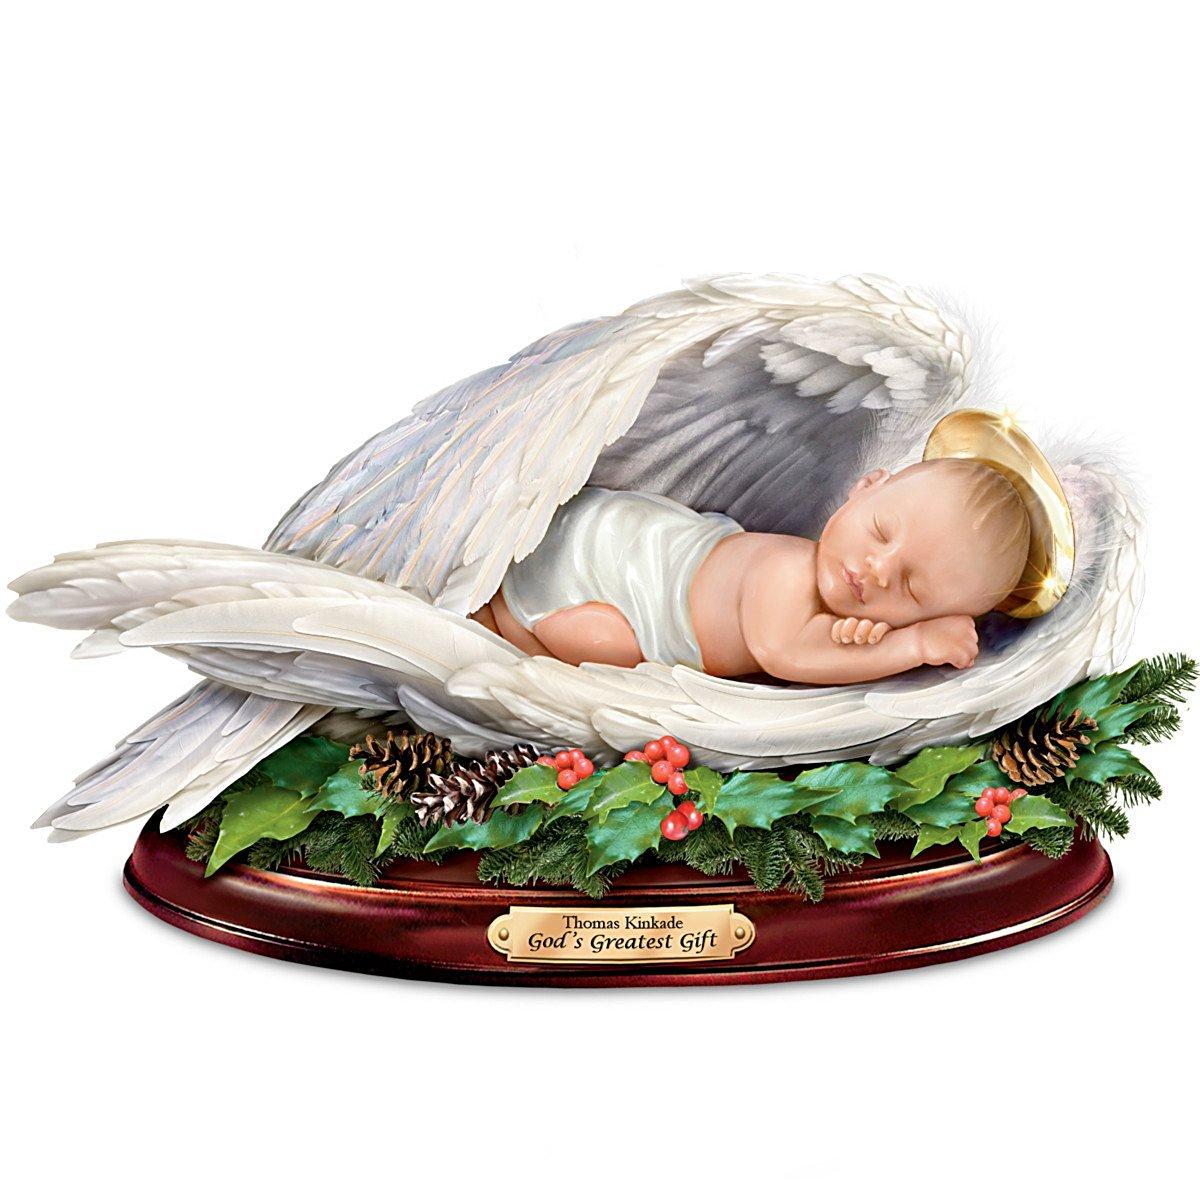 Thomas Kinkade Unto Us A Child is Born Sculpture by The Bradford Exchange Sculpture